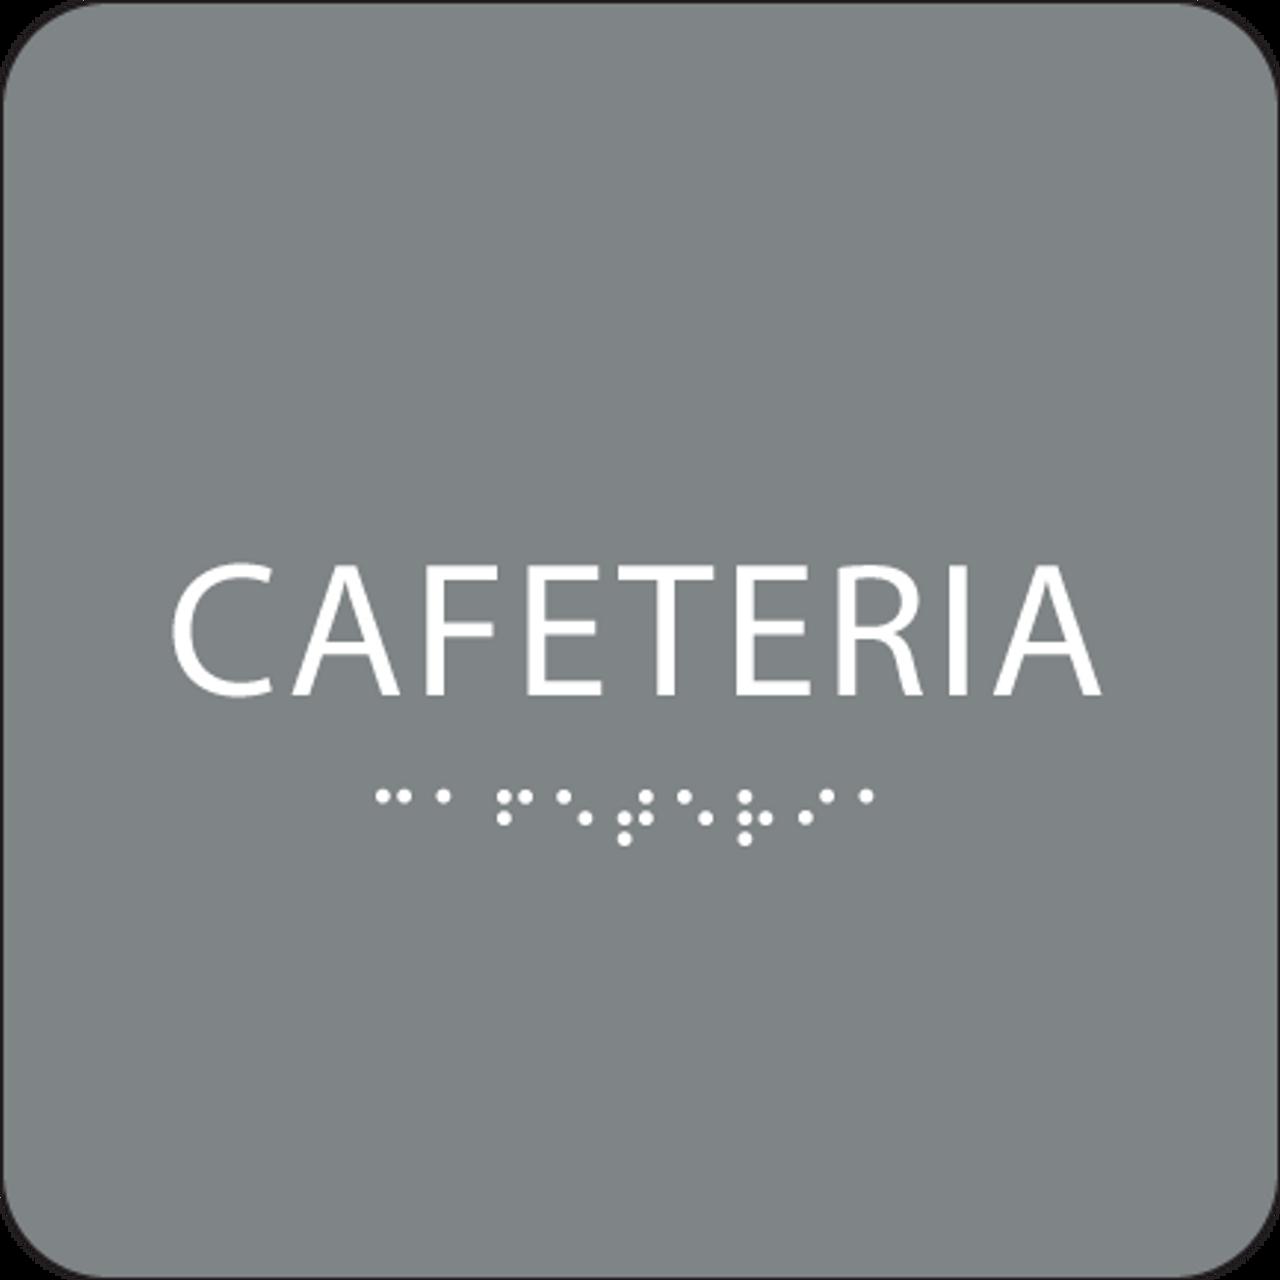 Grey Cafeteria ADA Sign